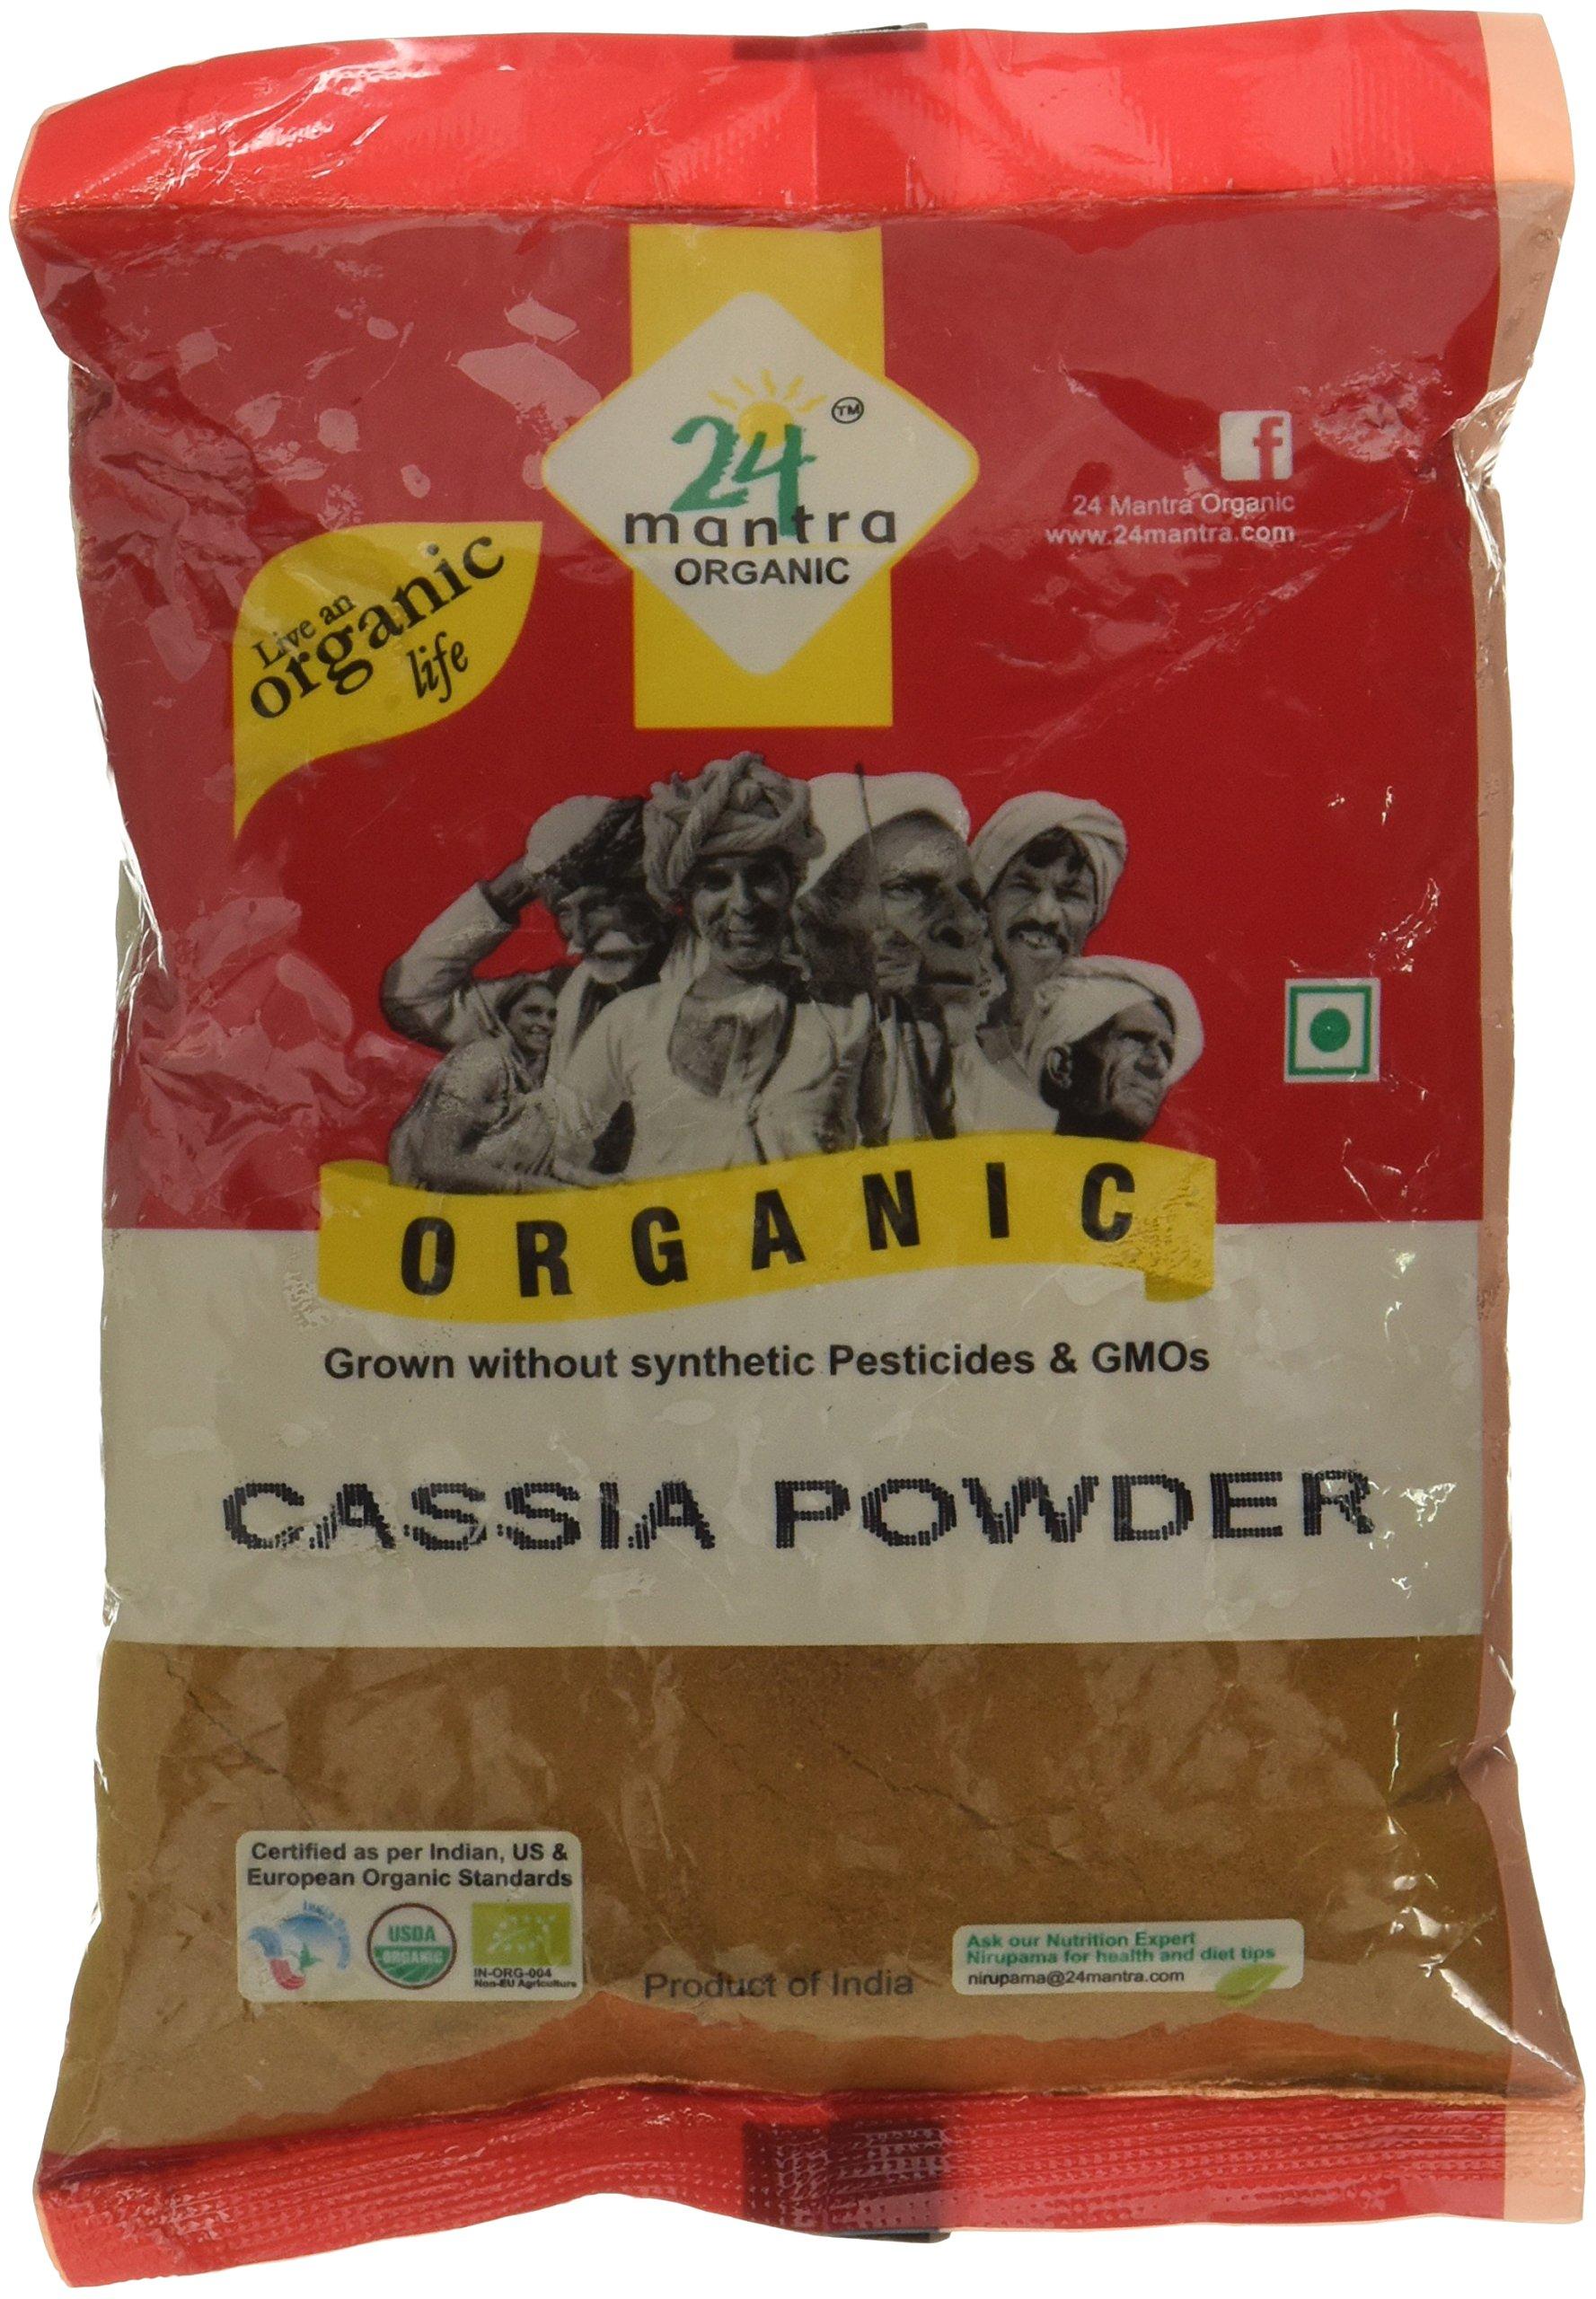 Amazon price history for 24 Mantra Organic Cassia Powder, 100g